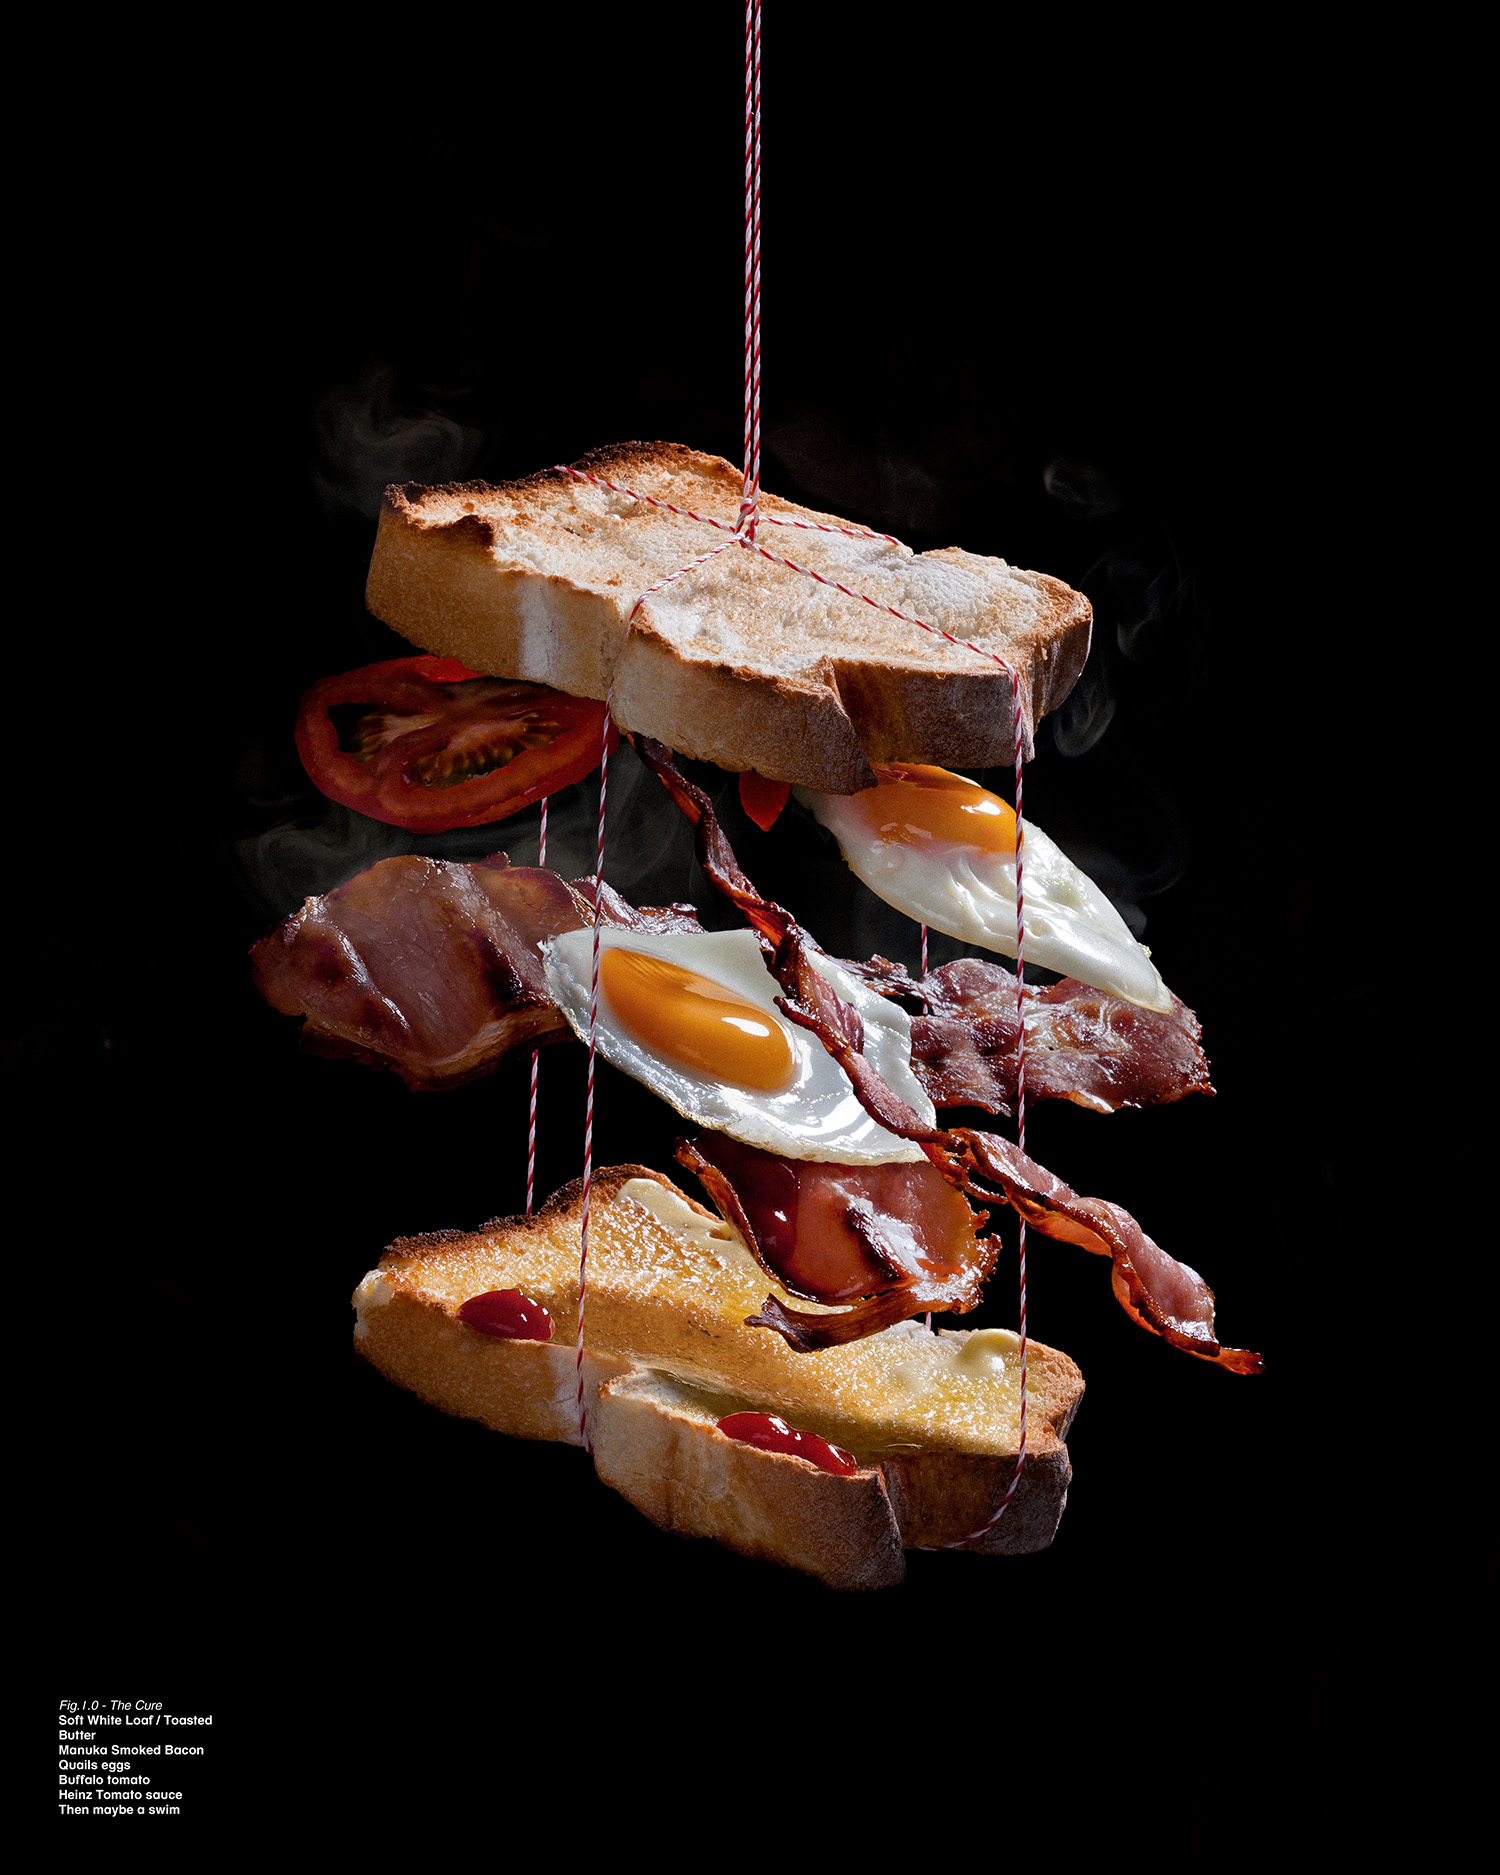 Hang Over  Agency:Maud  Art Director: David Park  Sandwich Wrangler: Ben Crick